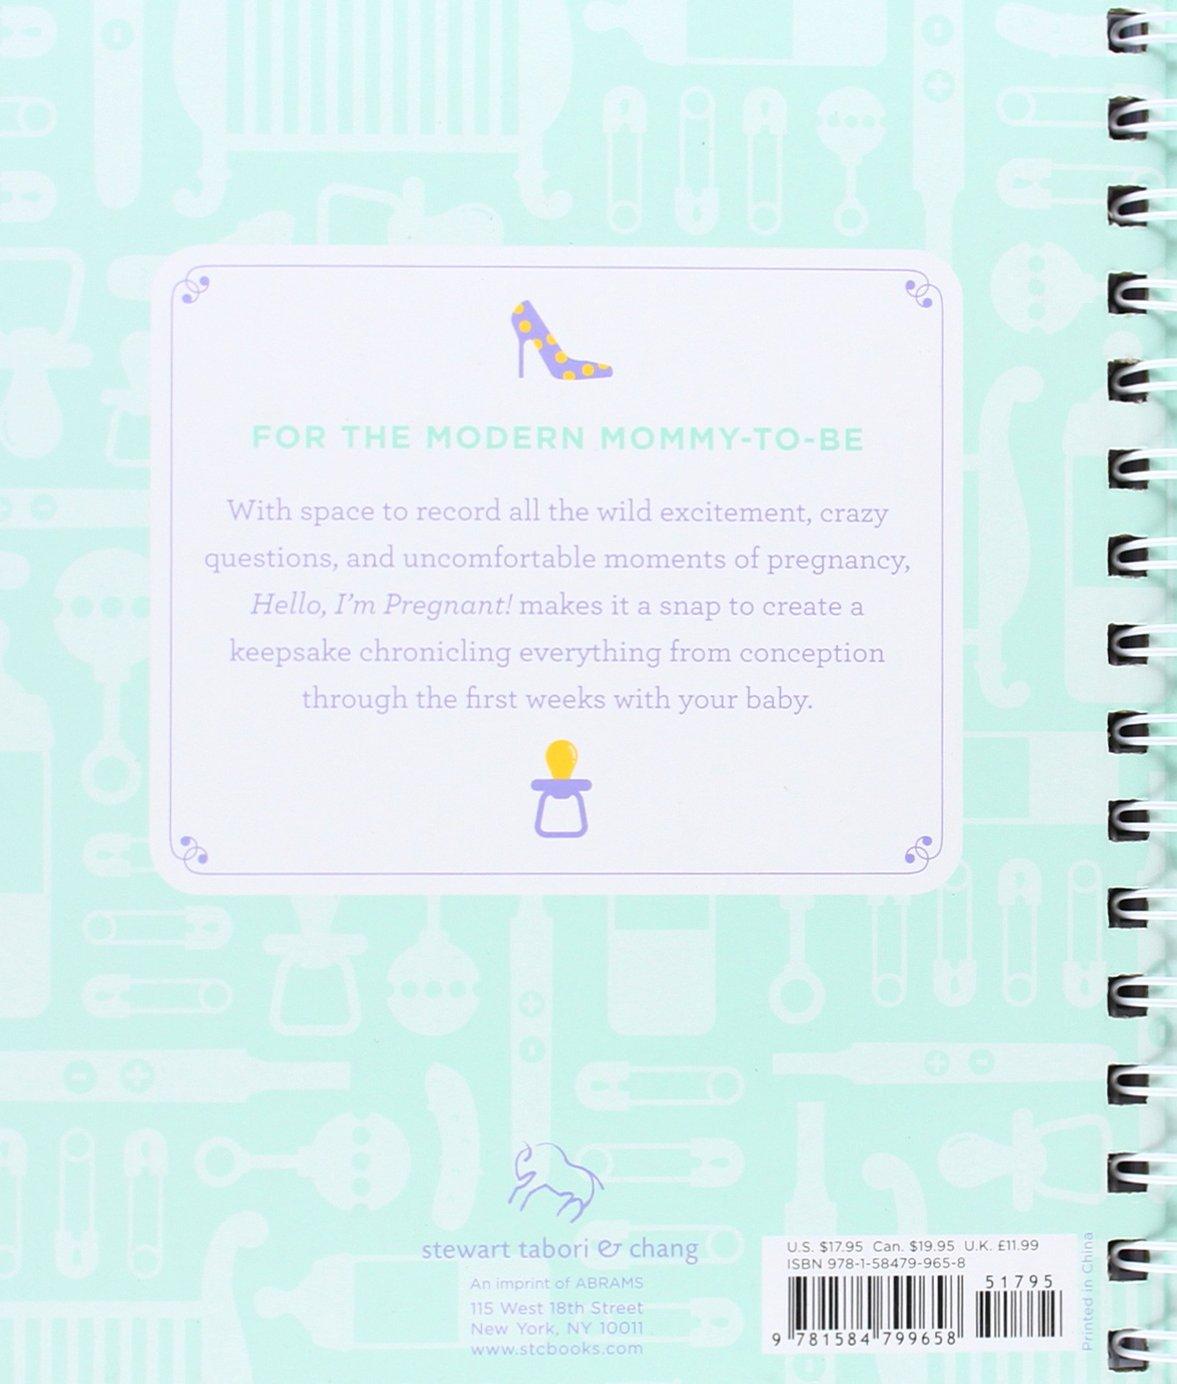 Hello im pregnant a journal alissa faden 9781584799658 a journal alissa faden 9781584799658 amazon books fandeluxe Gallery